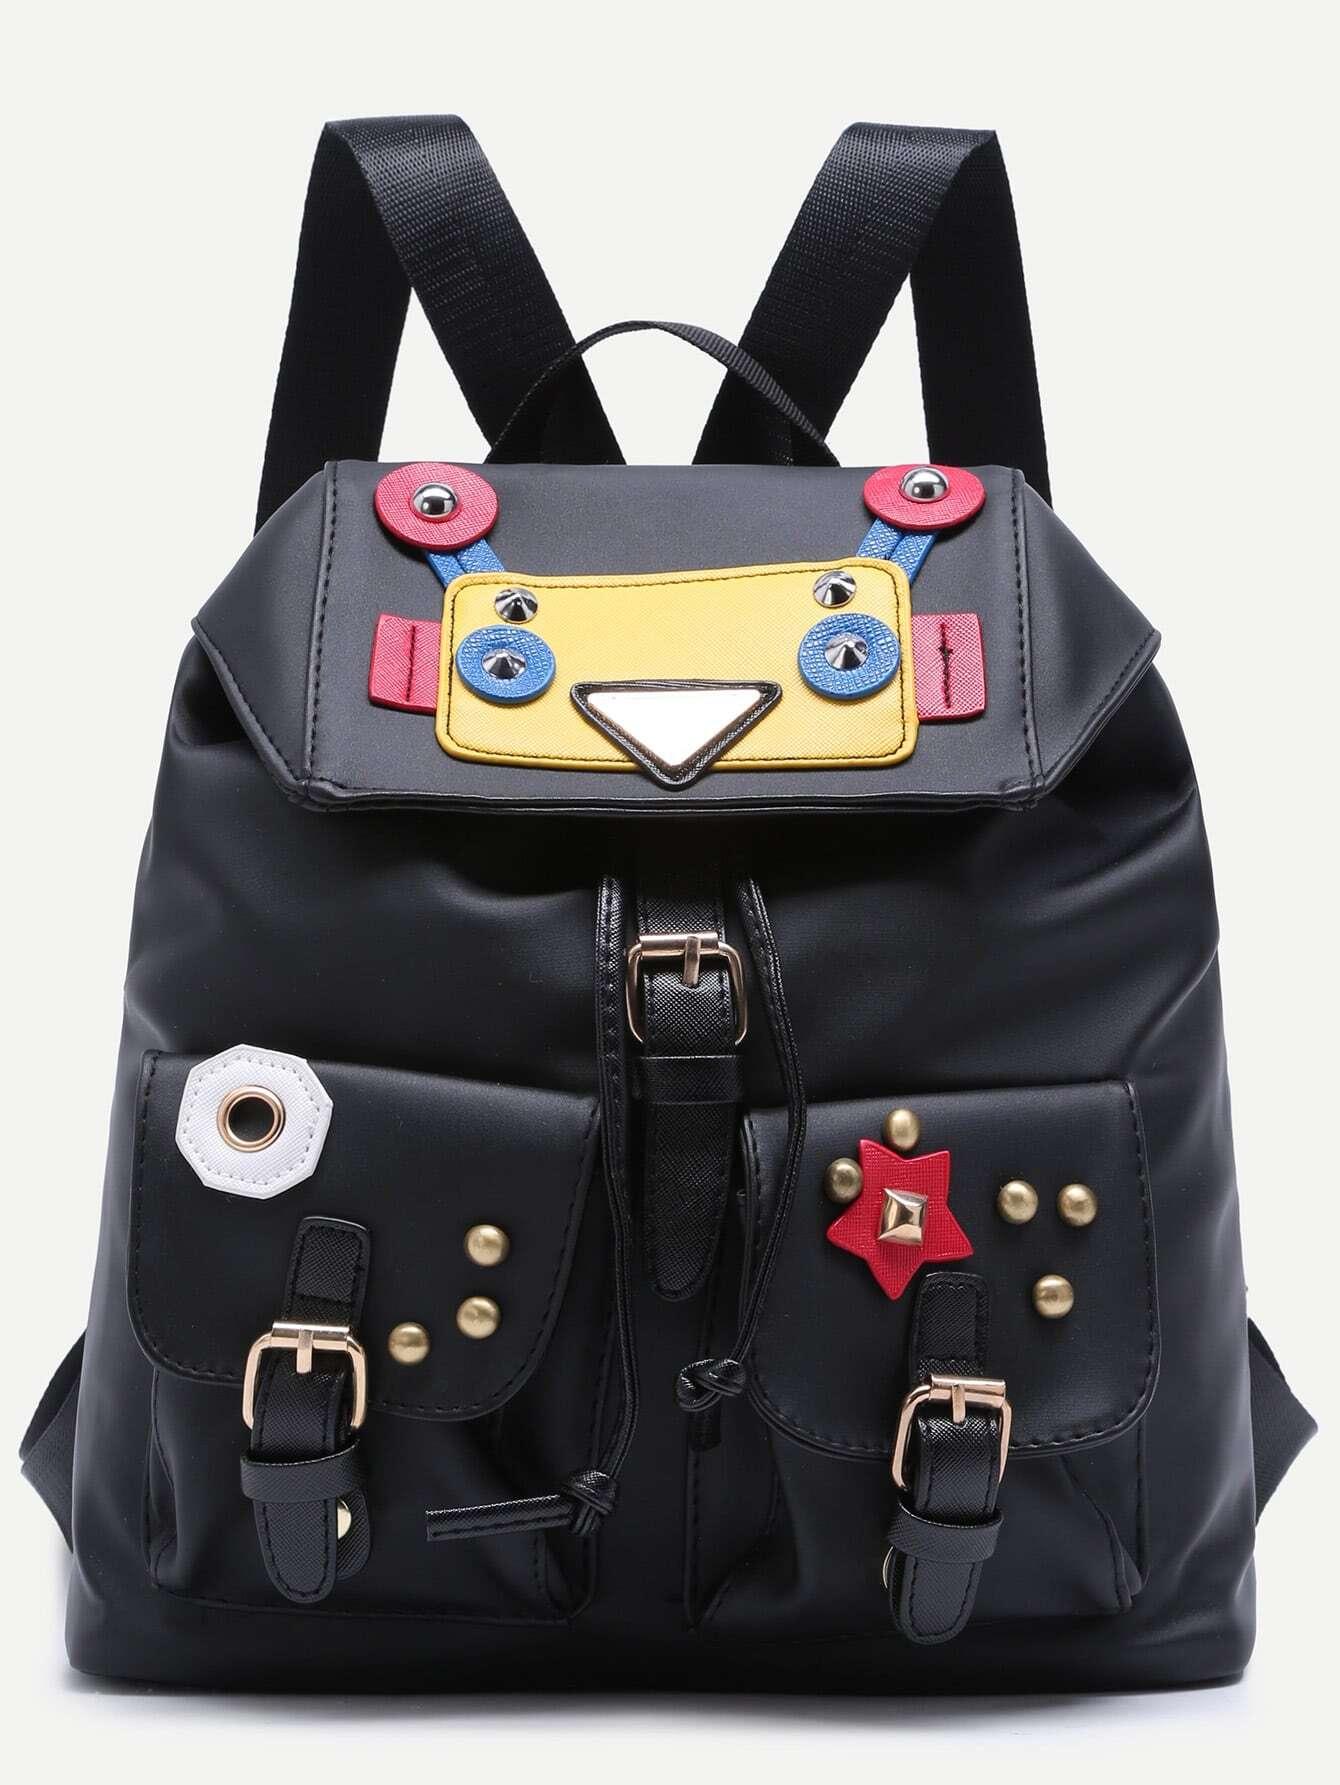 Фото Wacky Robot Double Buckled Pocket Studded Nylon Backpack. Купить с доставкой